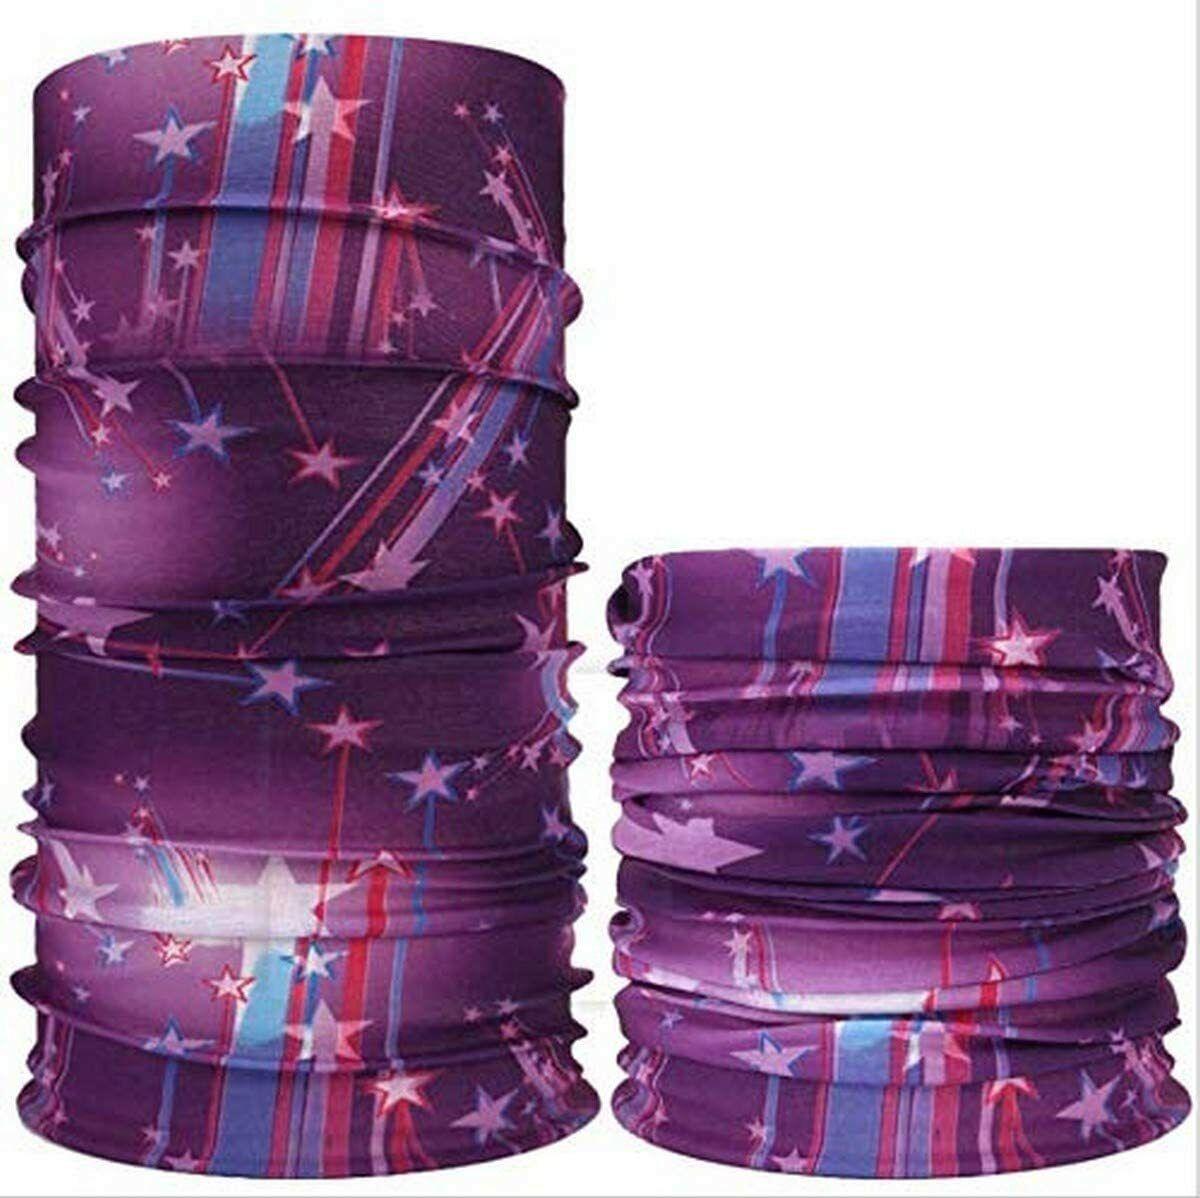 Magic Headband Elastic Seamless Bandana Scarf UV Resistence Headwear Protective Clothing, Shoes & Accessories